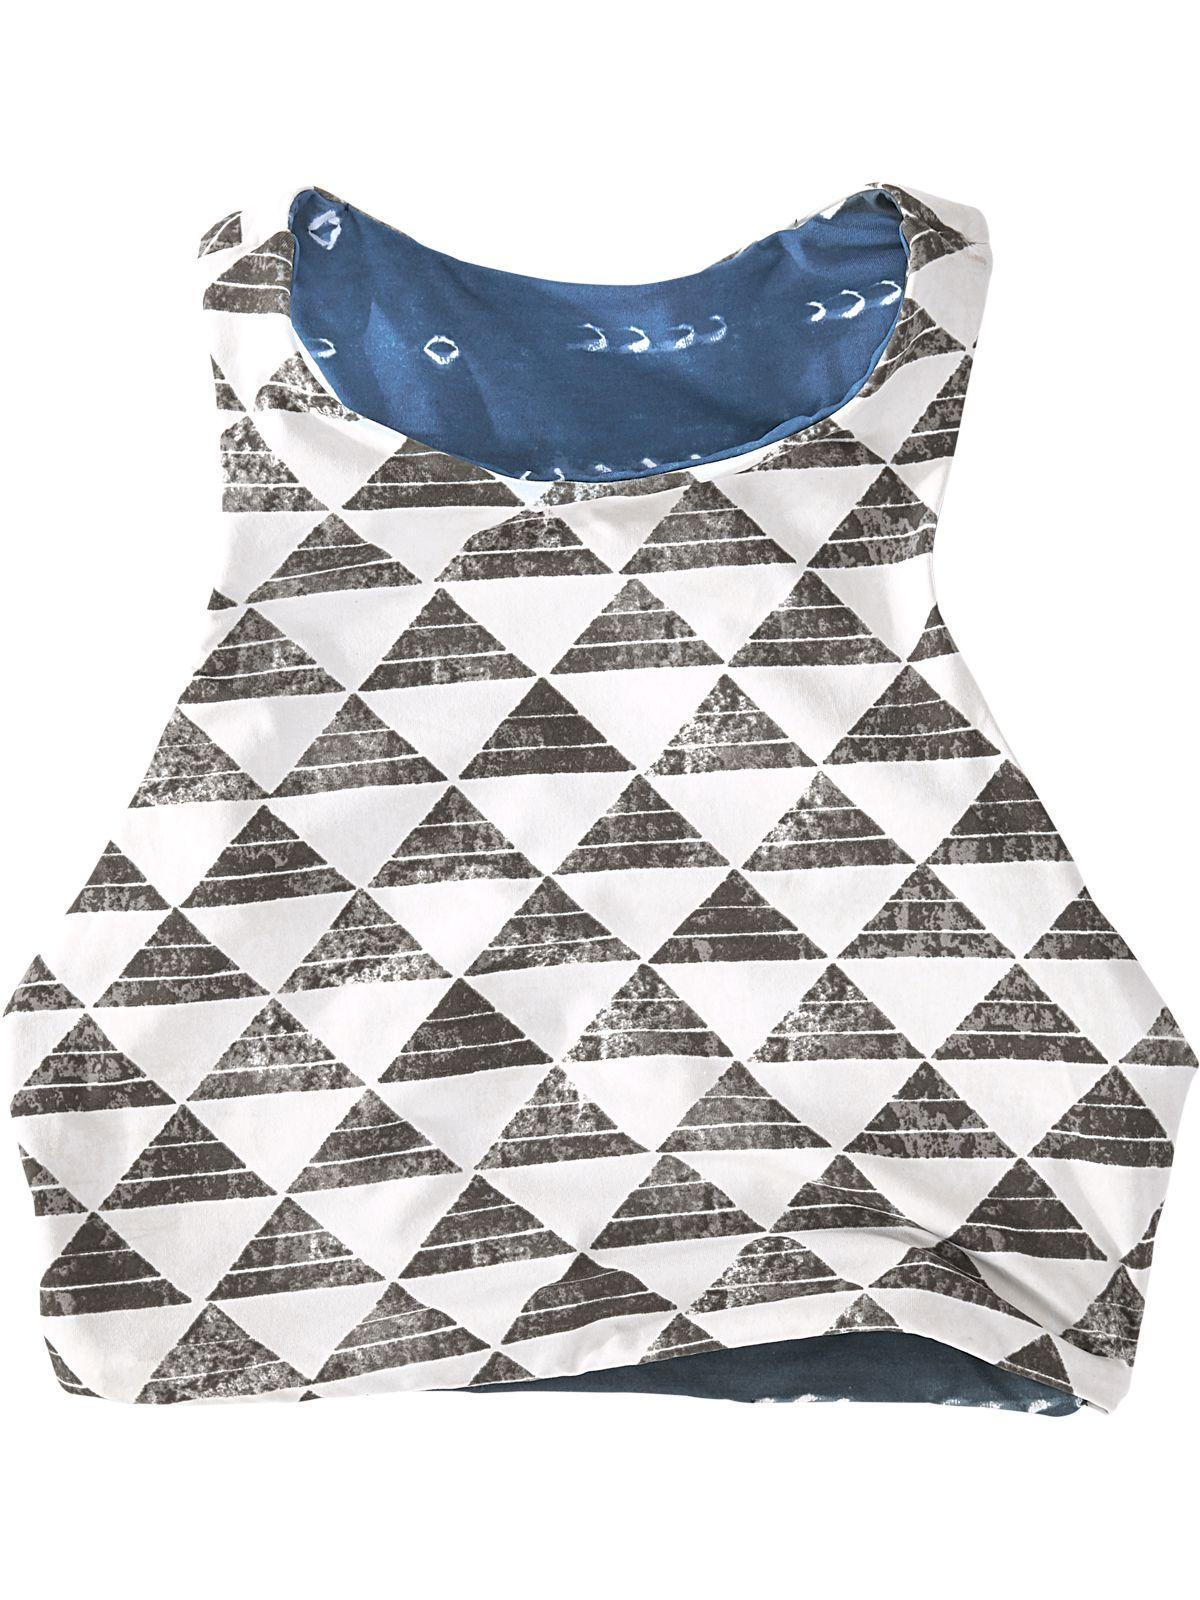 cf60bb0f46844 Encinitas Reversible Bikini Top - Shibori Triangle. Title Nine. T9. IX.  High neckline Bikini. Reversible print. Racerback